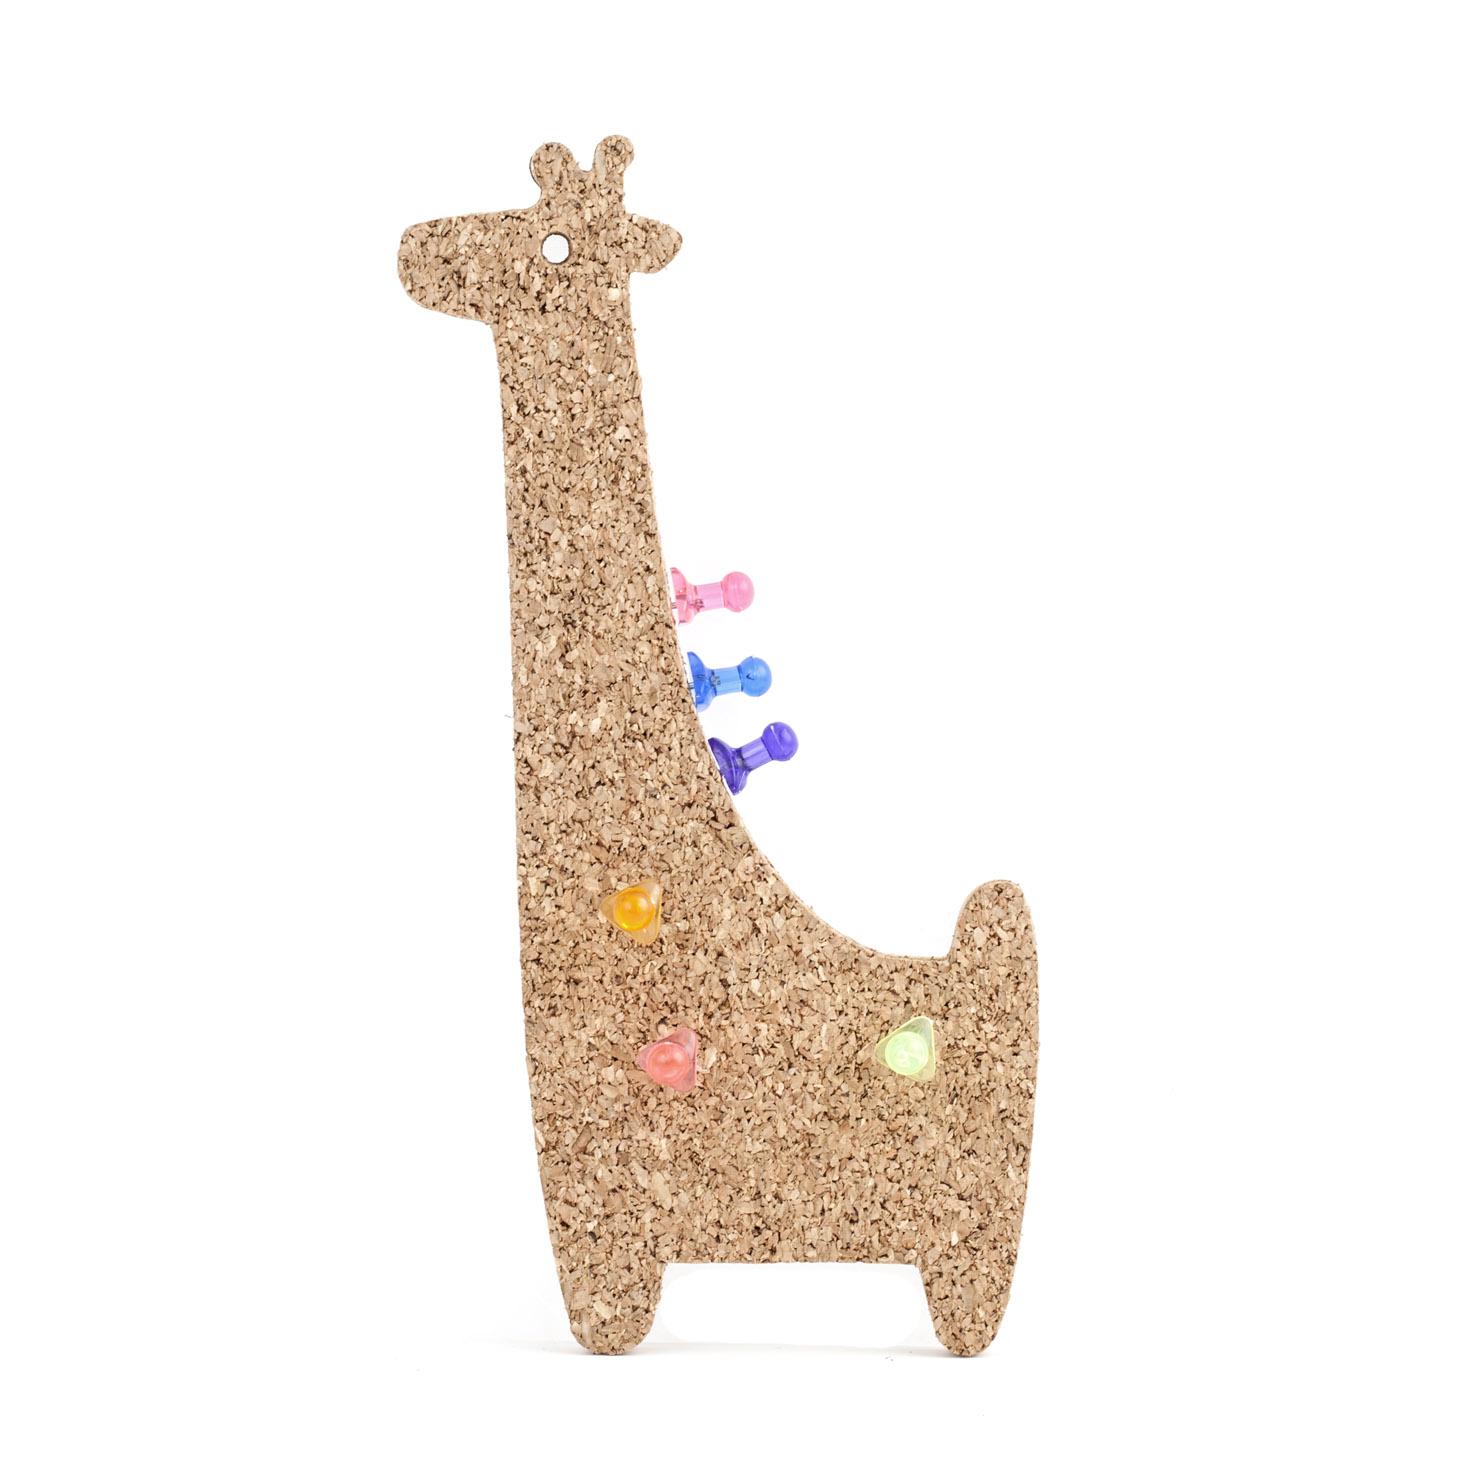 giraffe-corkboard-magnet-1